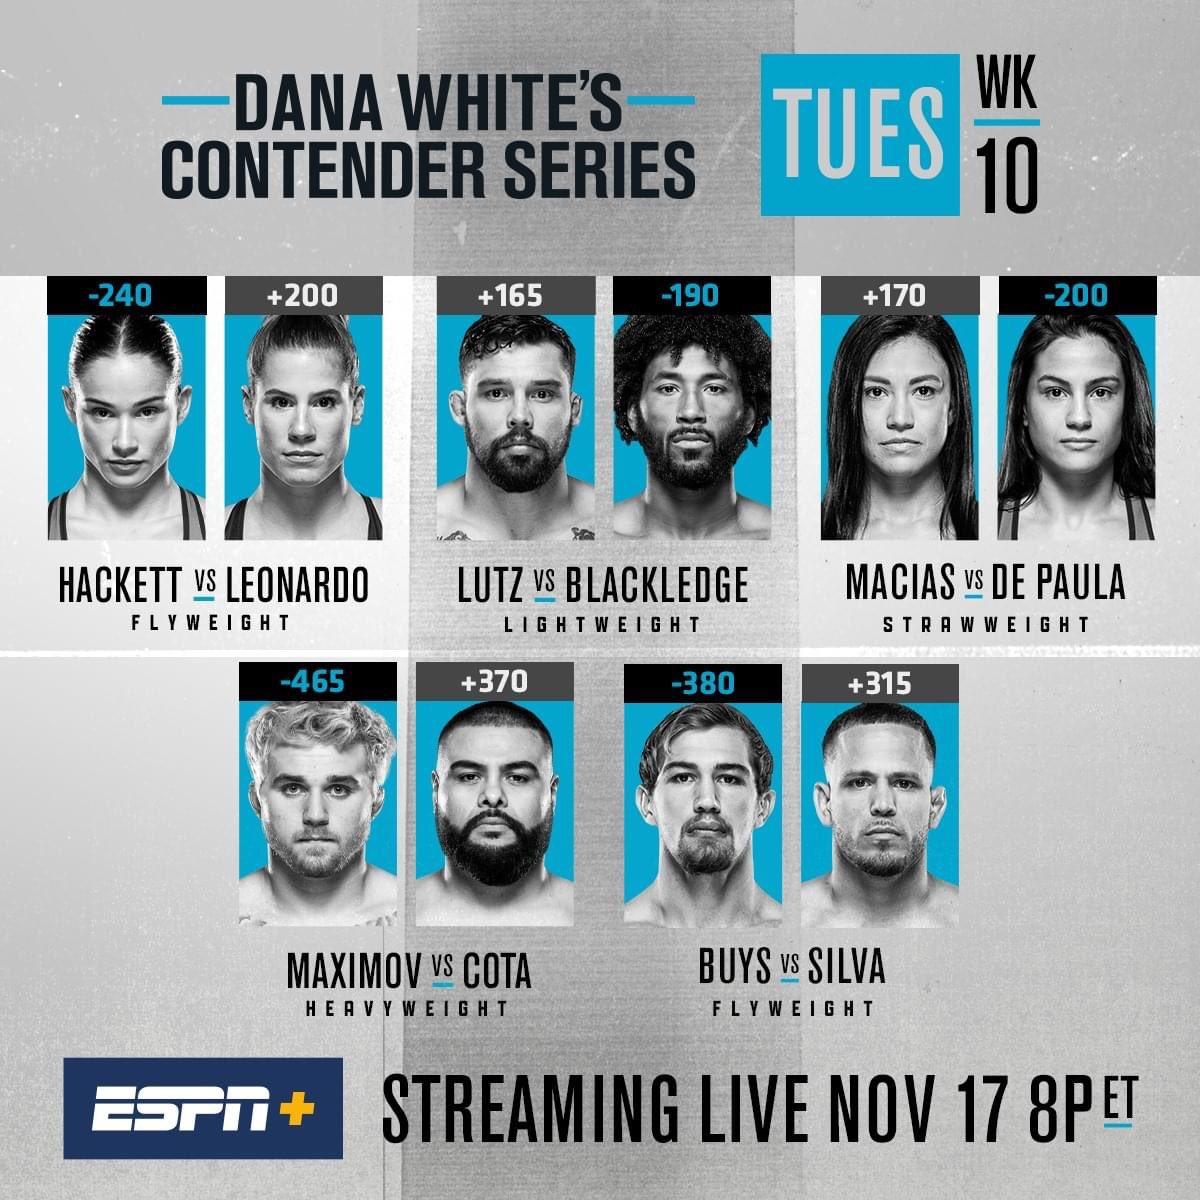 #NowWatching - Dana White's Contender Series 36 #UFC #DanaWhitesContenderSeries36 #DWCS36 #DWCS #UFCLasVegas #ESPNPlus #MMA https://t.co/JbUirU68MN